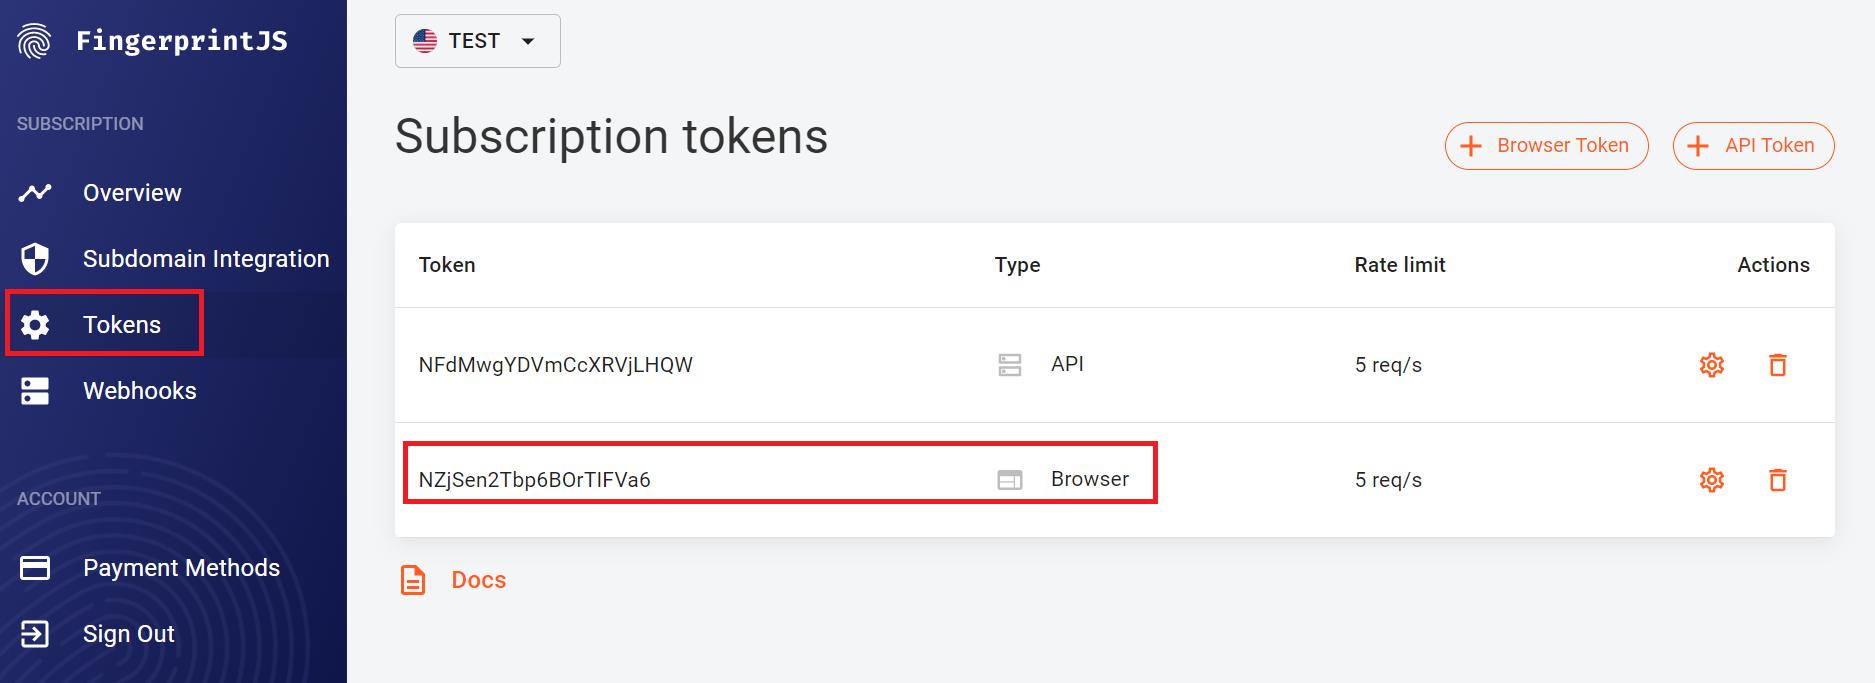 Screenshot of tokens in FingerprintJS dashboard